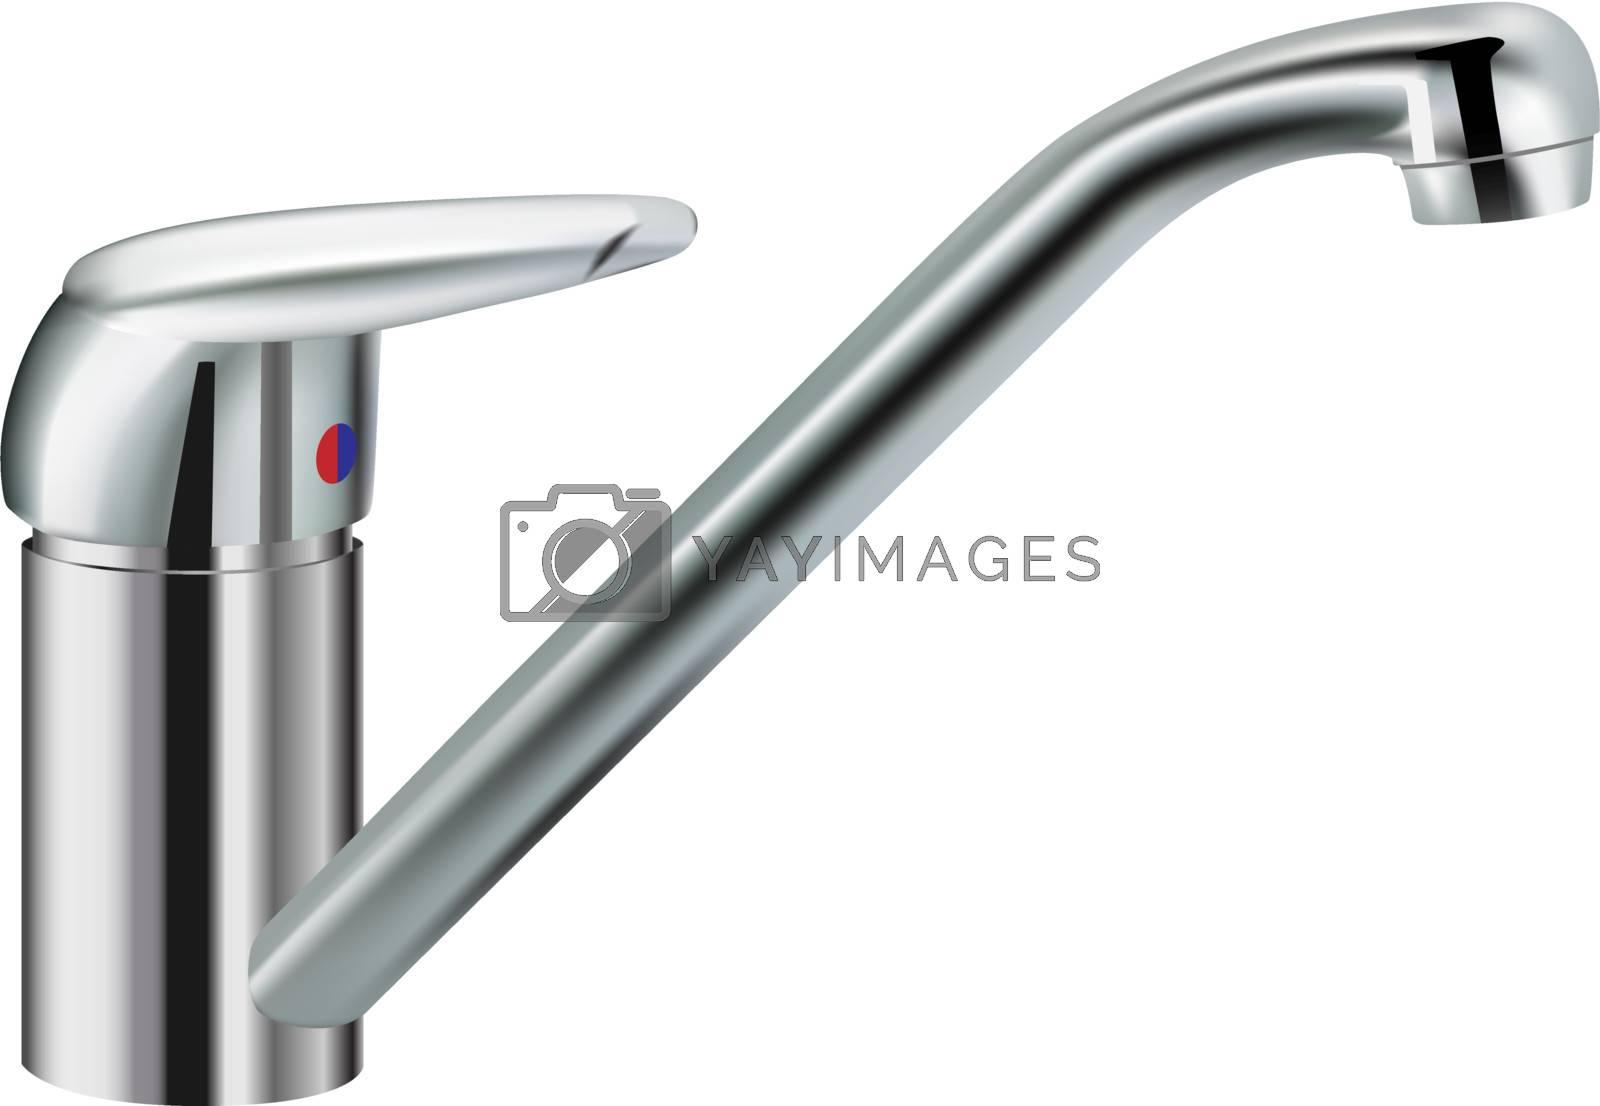 silver metallic water tap on white background